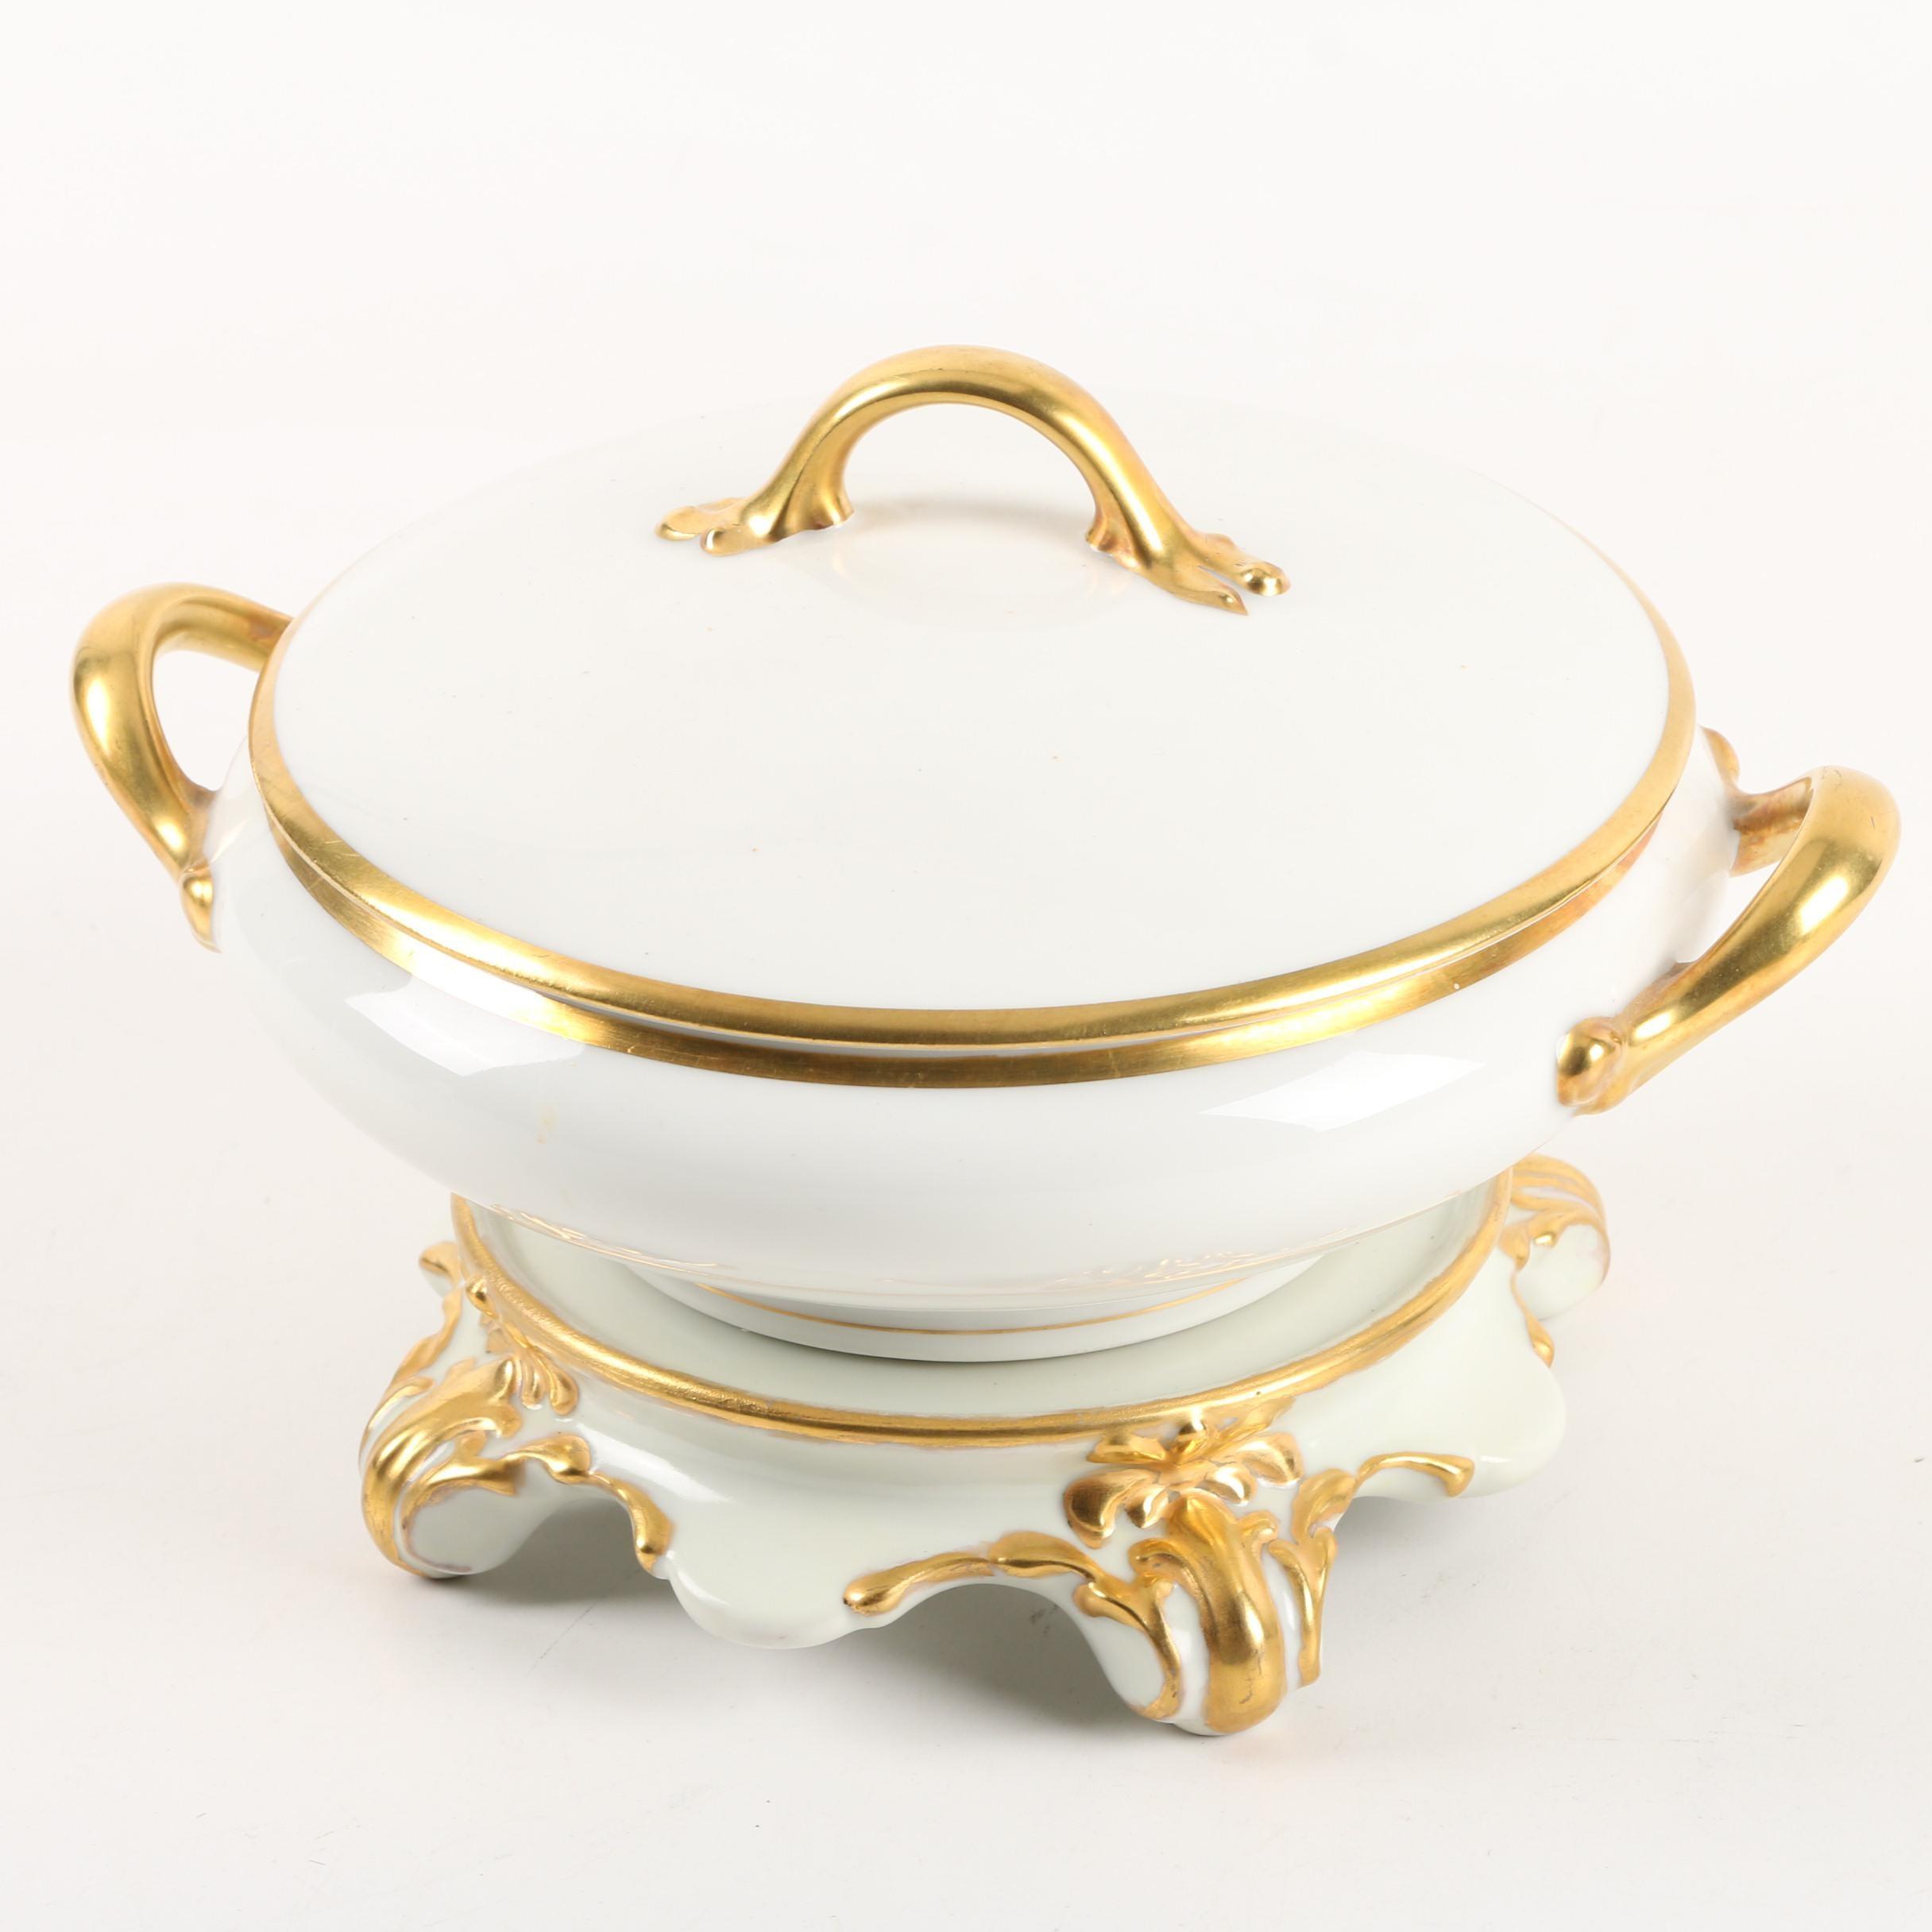 Vintage Vignaud Limoges Porcelain Vegetable Bowl with Stand